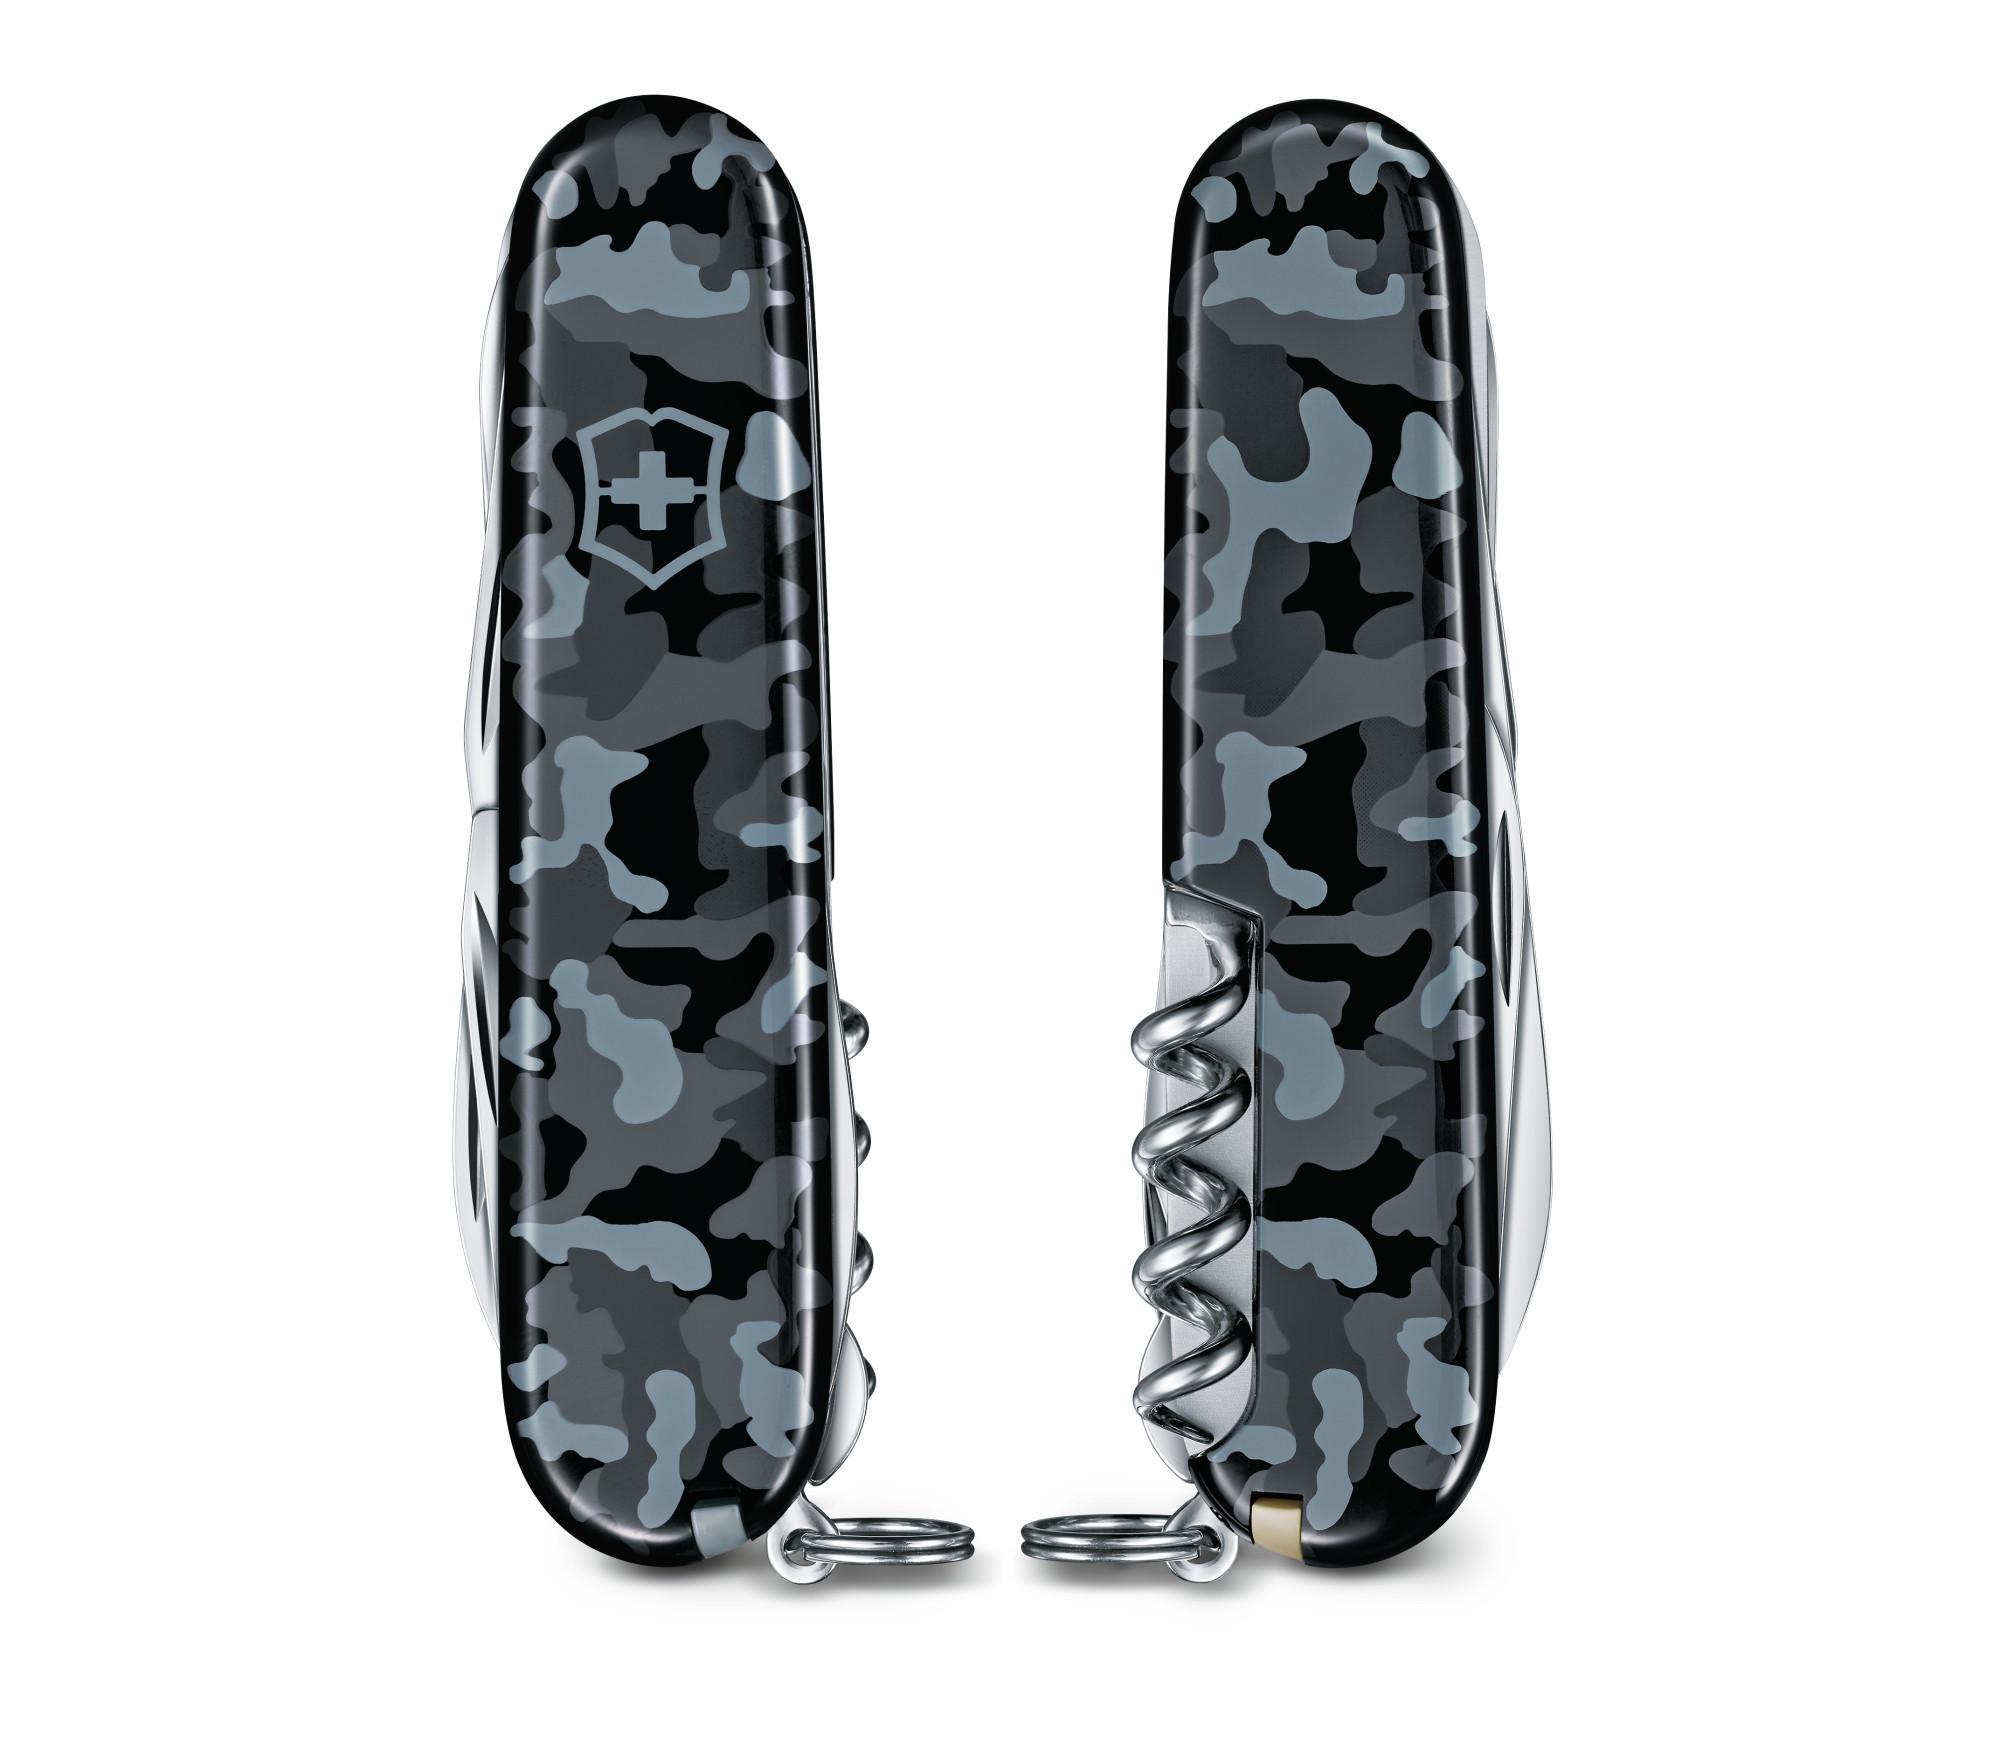 Складной нож Victorinox Huntsman Navy Camouflage (1.3713.942) 91 мм., 15 функций, морской камуфляж - Wenger-Victorinox.Ru